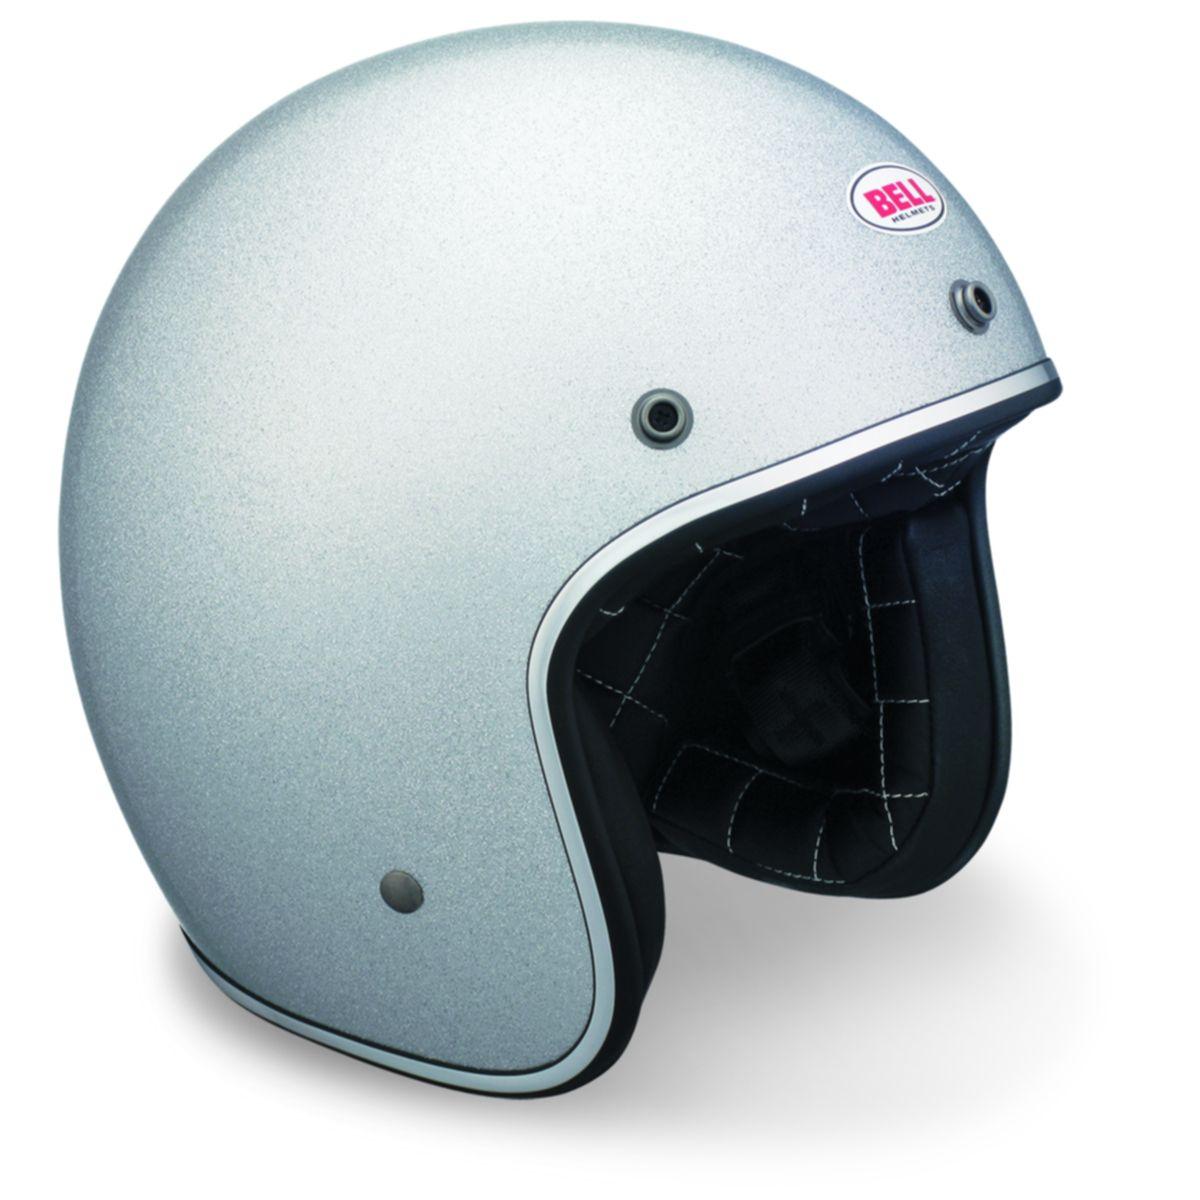 Thehelmetman Com Bell Custom 500 Silver Flake Open Face Helmet Closeout 68 99 Http Thehe Vintage Helmet Open Face Helmets Open Face Motorcycle Helmets